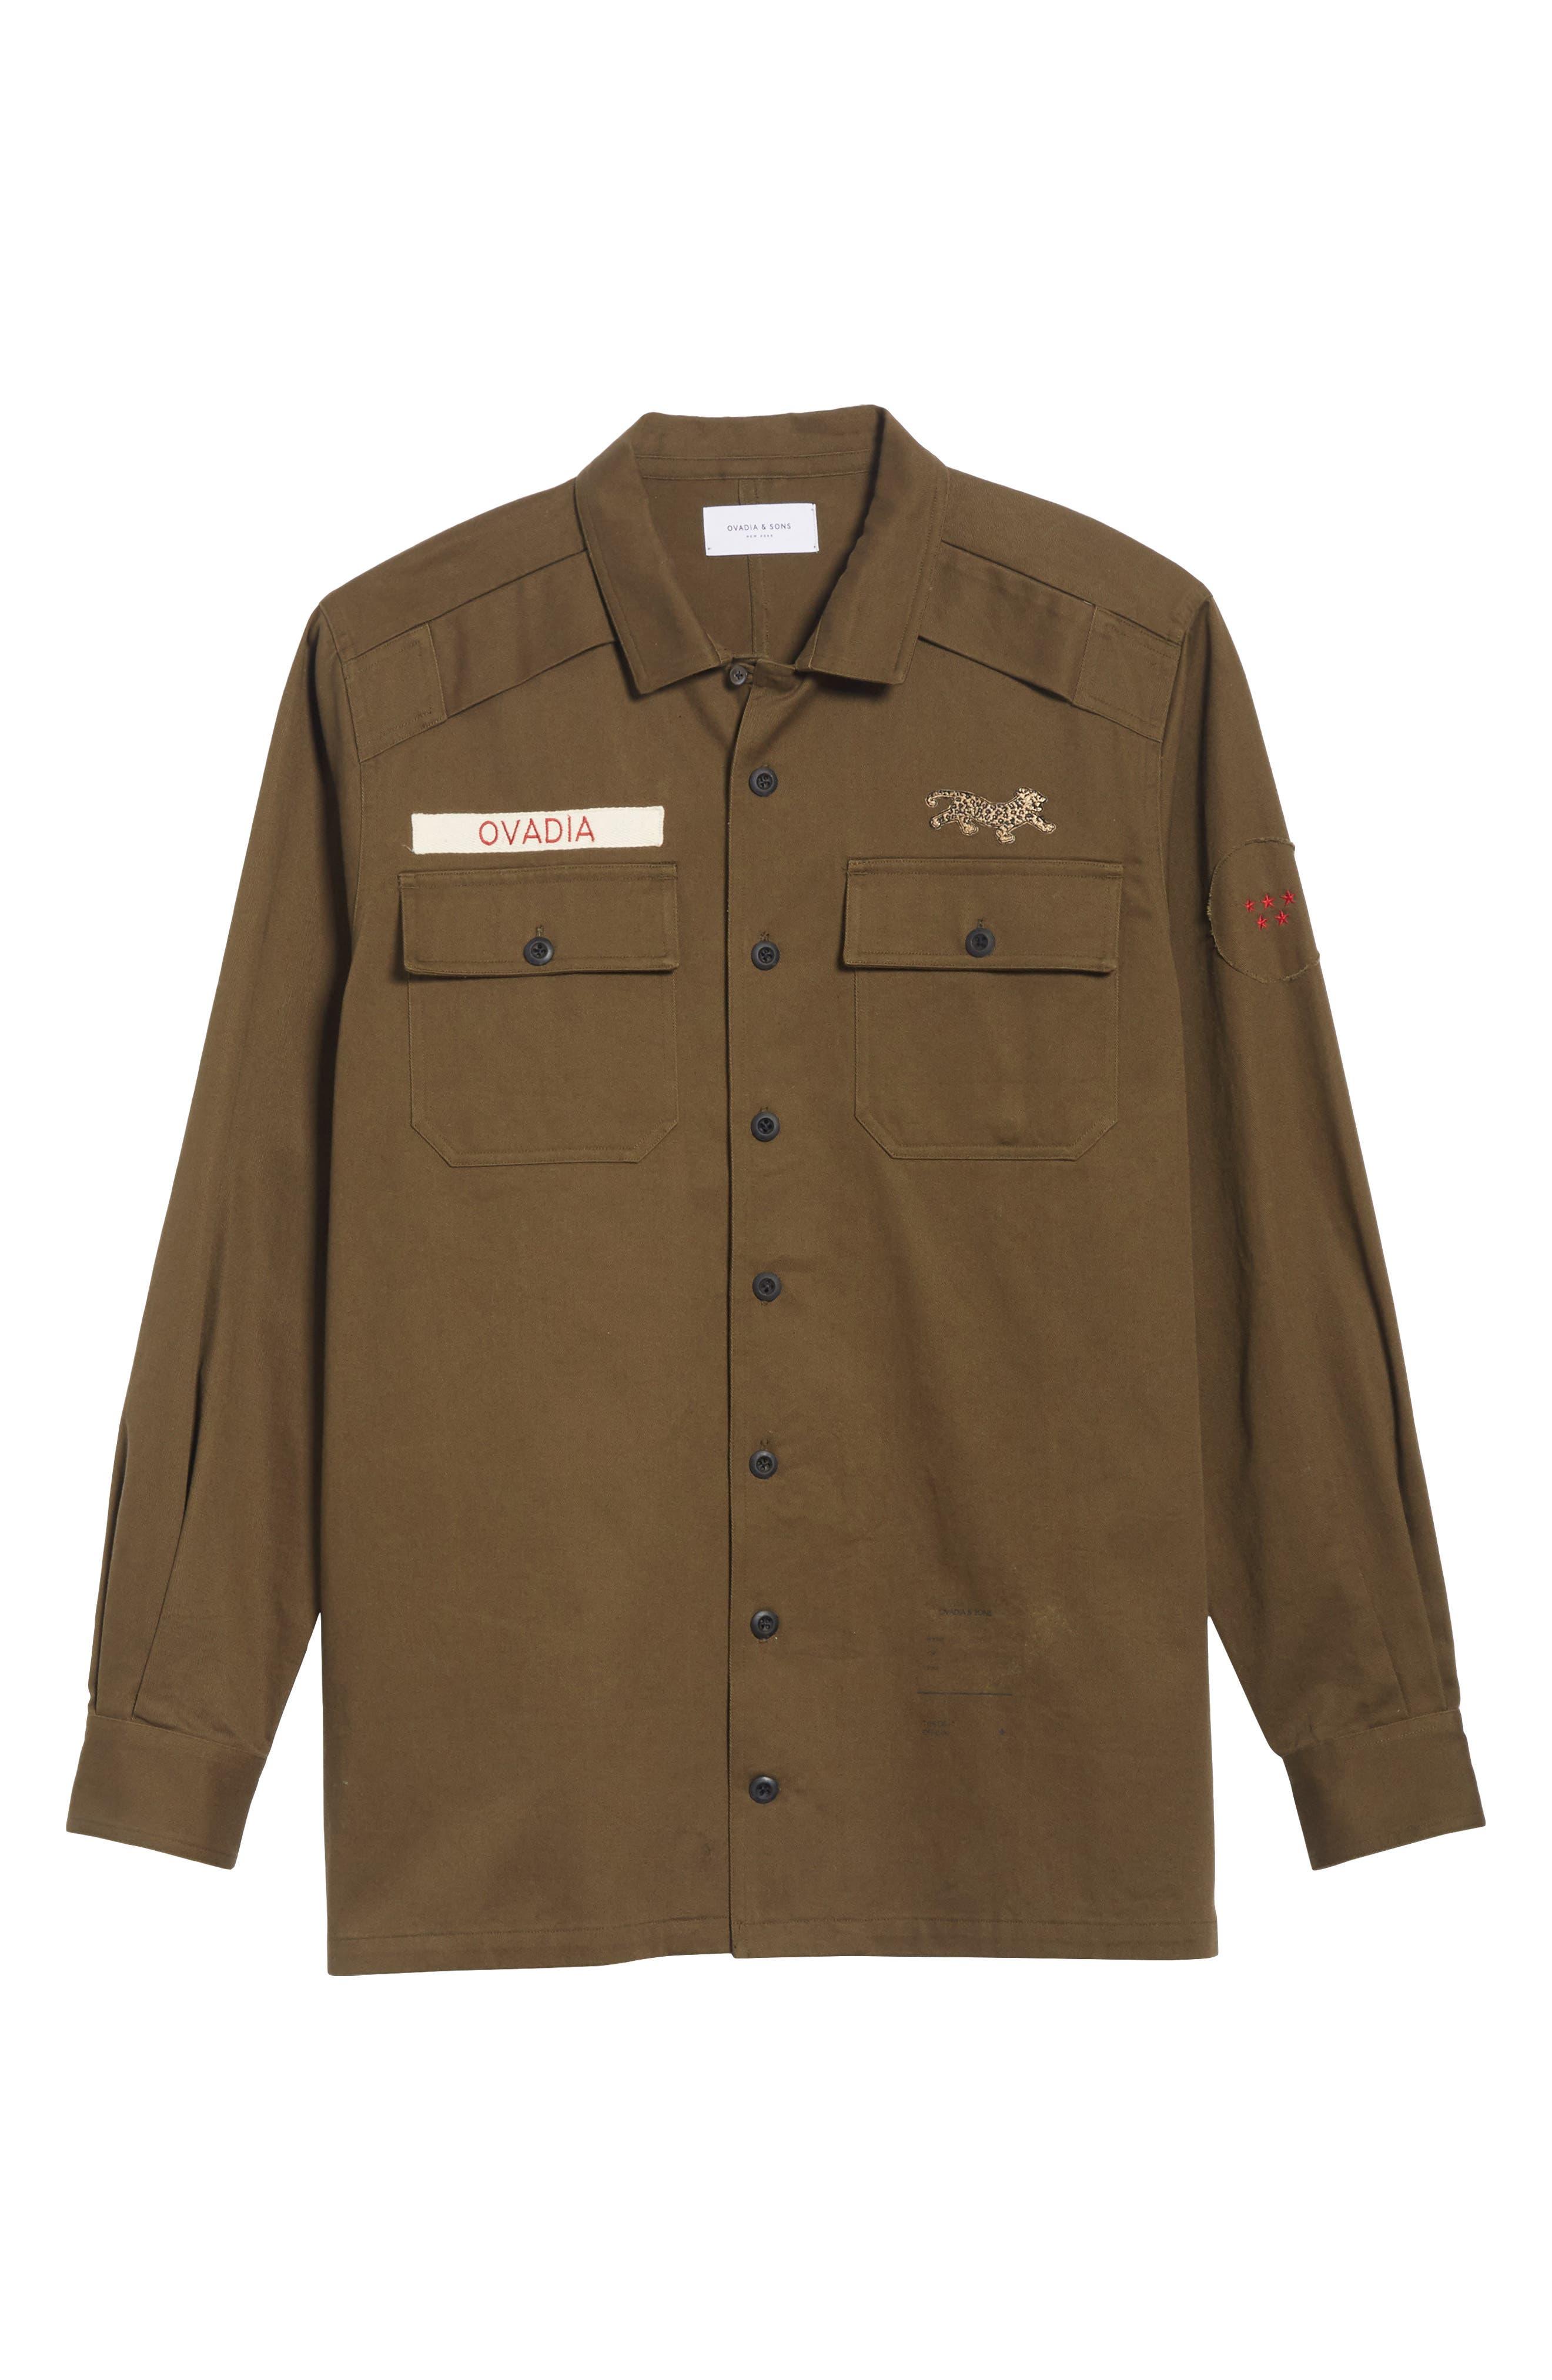 OVADIA & SONS,                             Military Woven Shirt,                             Alternate thumbnail 6, color,                             325